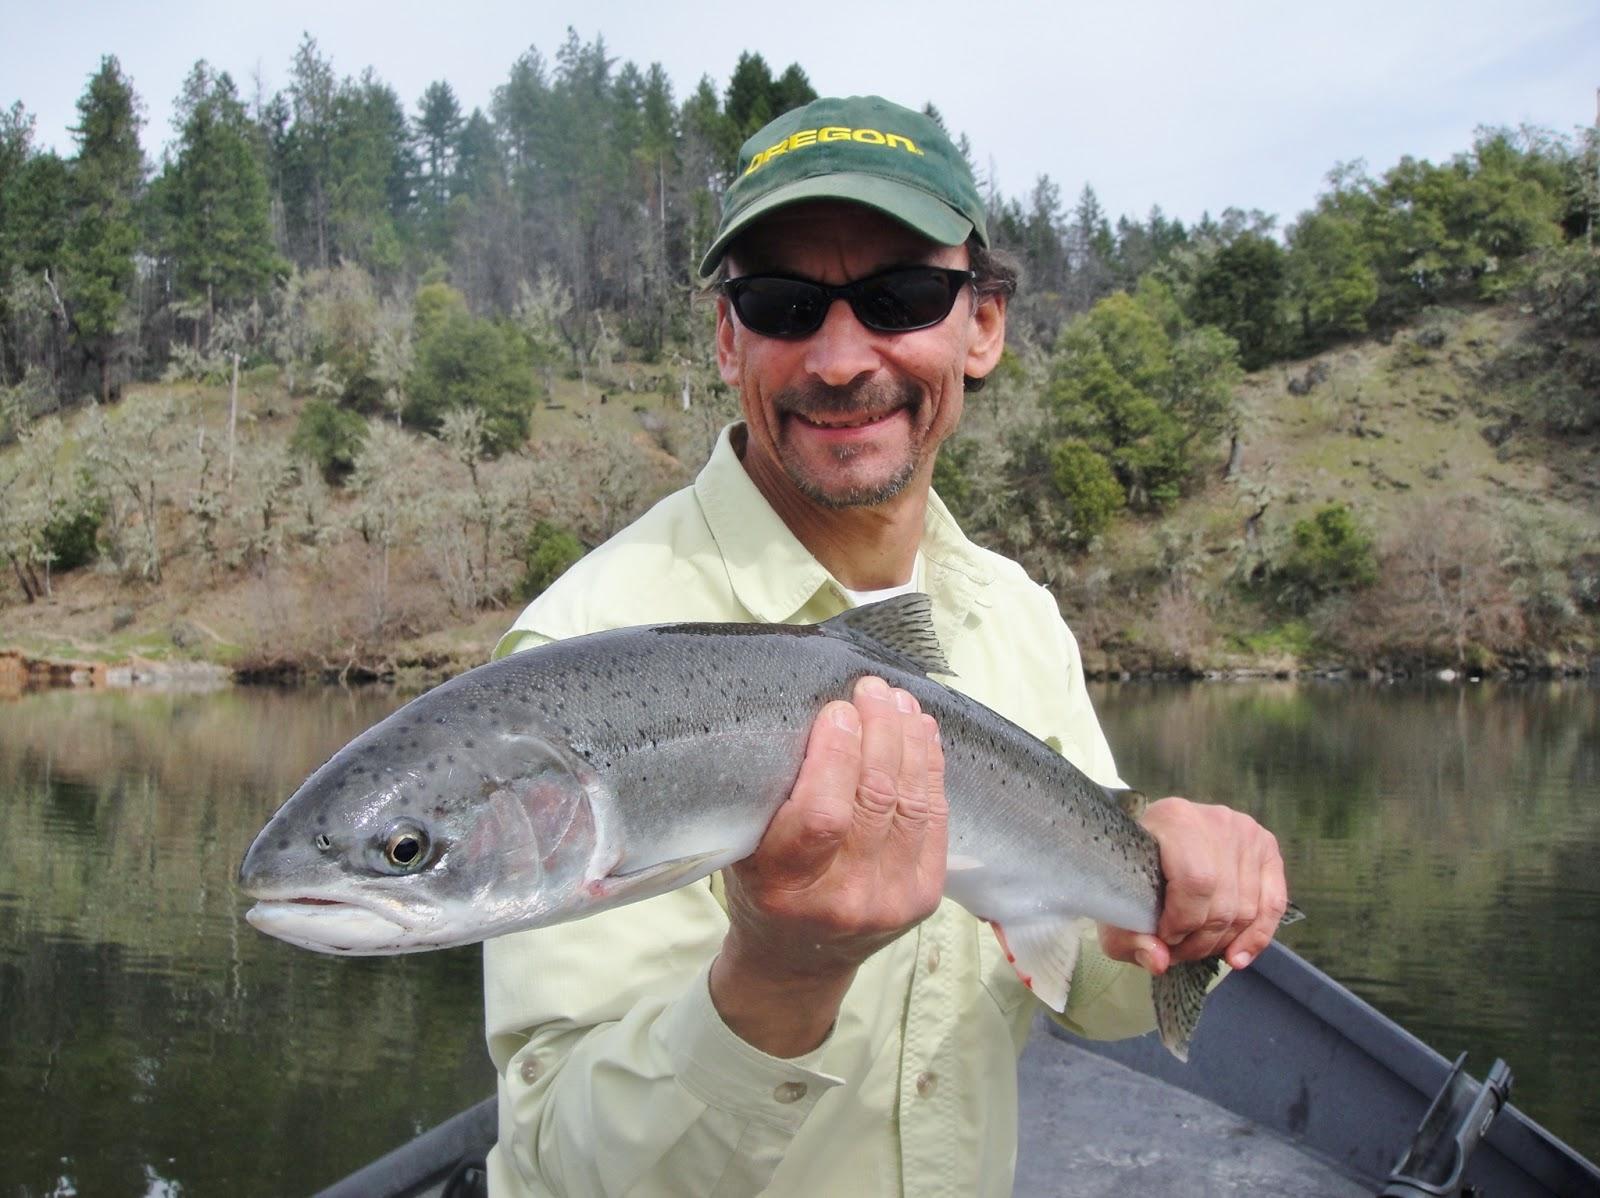 Rogue river report rogue river fishing guides guided for Rogue river fishing report